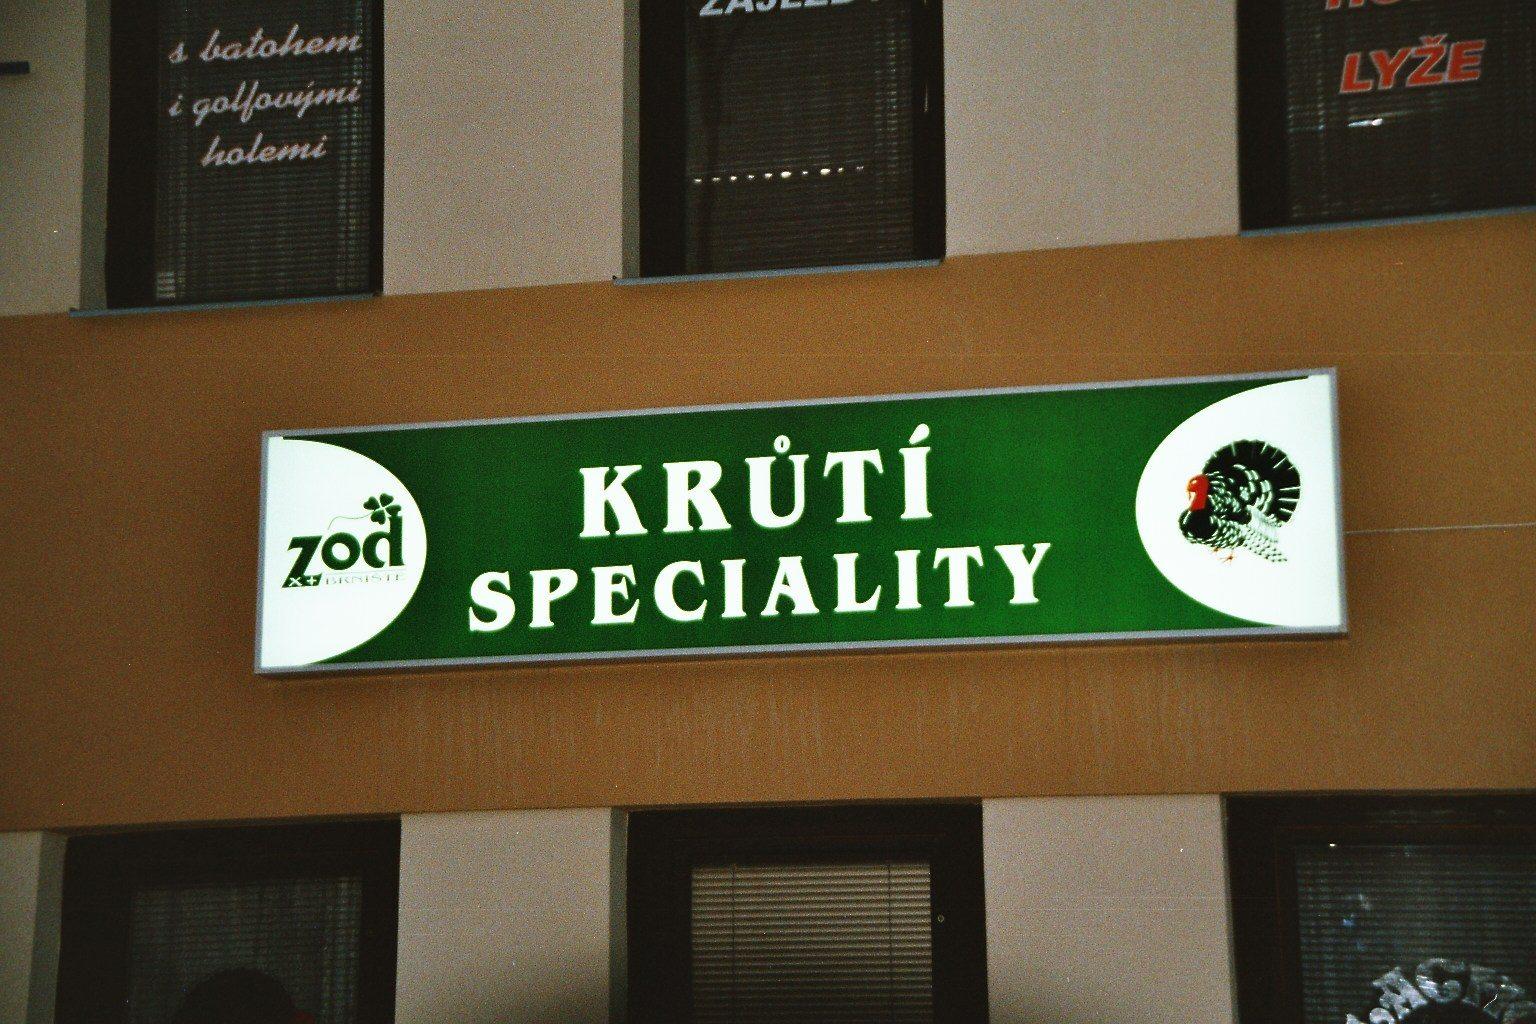 Novy Bor - Kruti